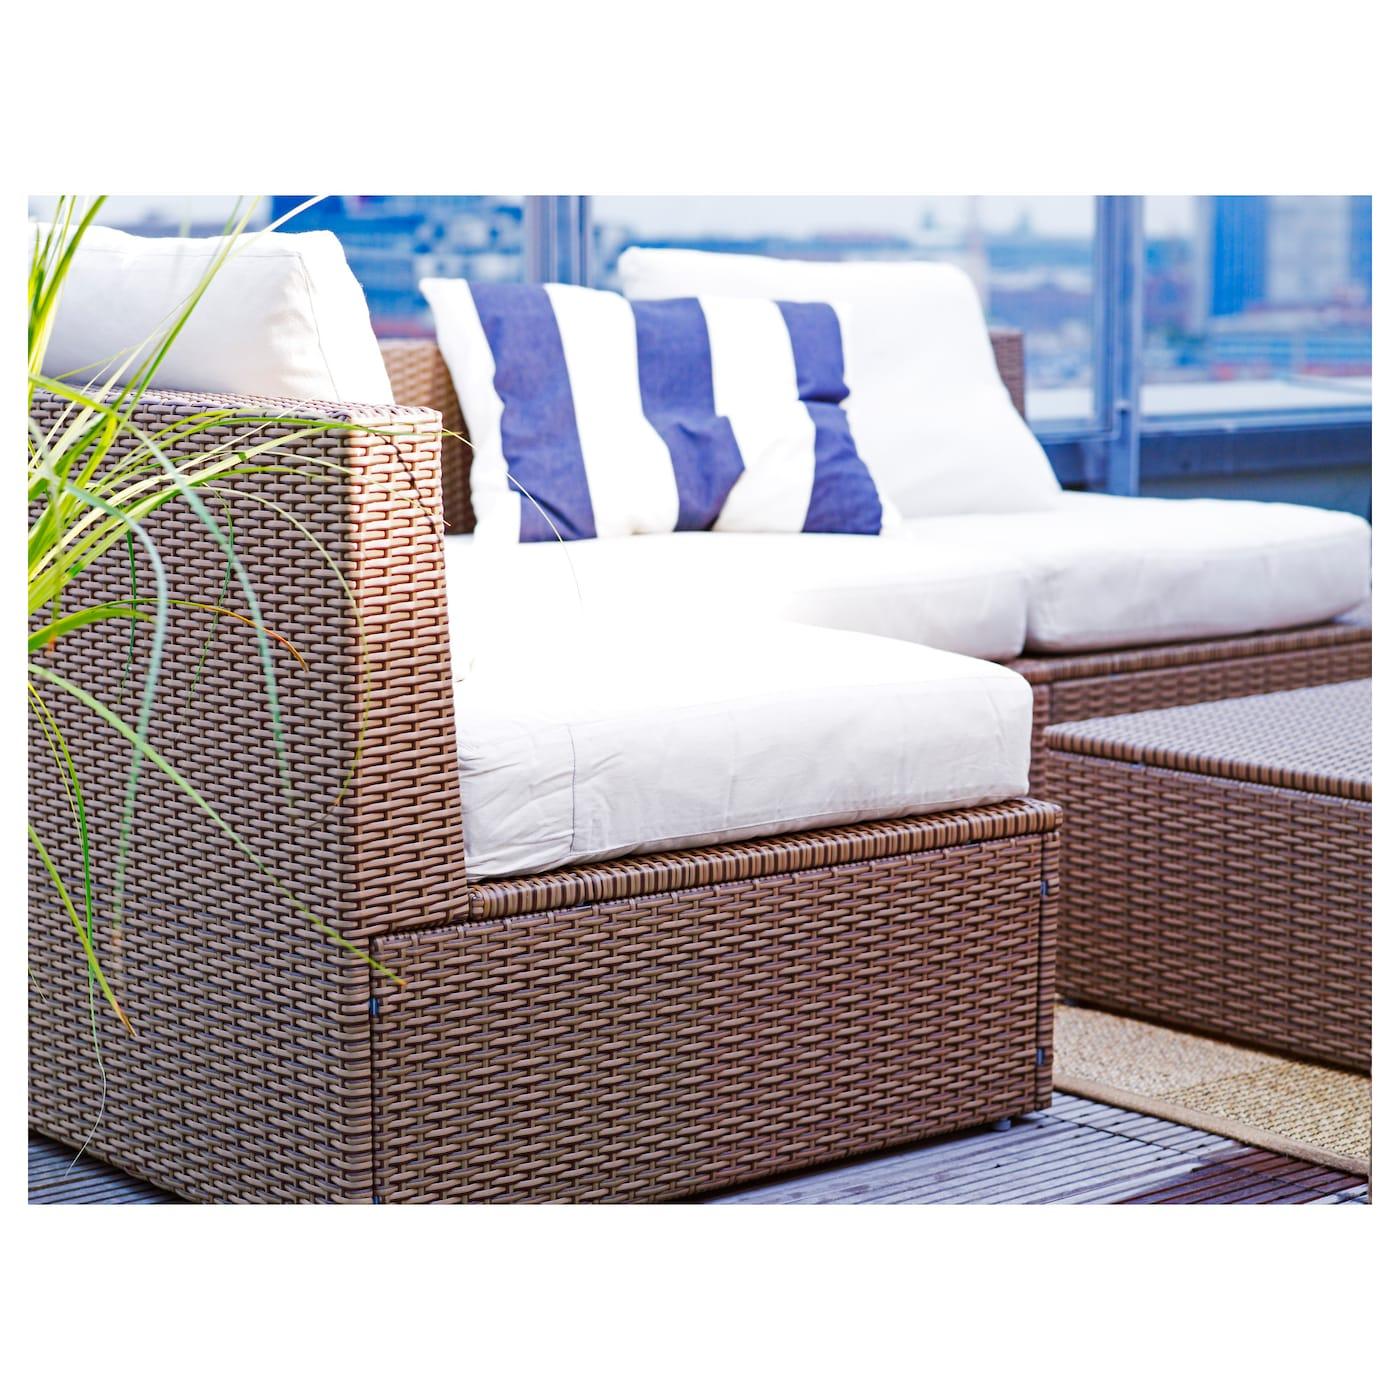 ARHOLMA Seat cushion outdoor Beige 65x65 cm IKEA